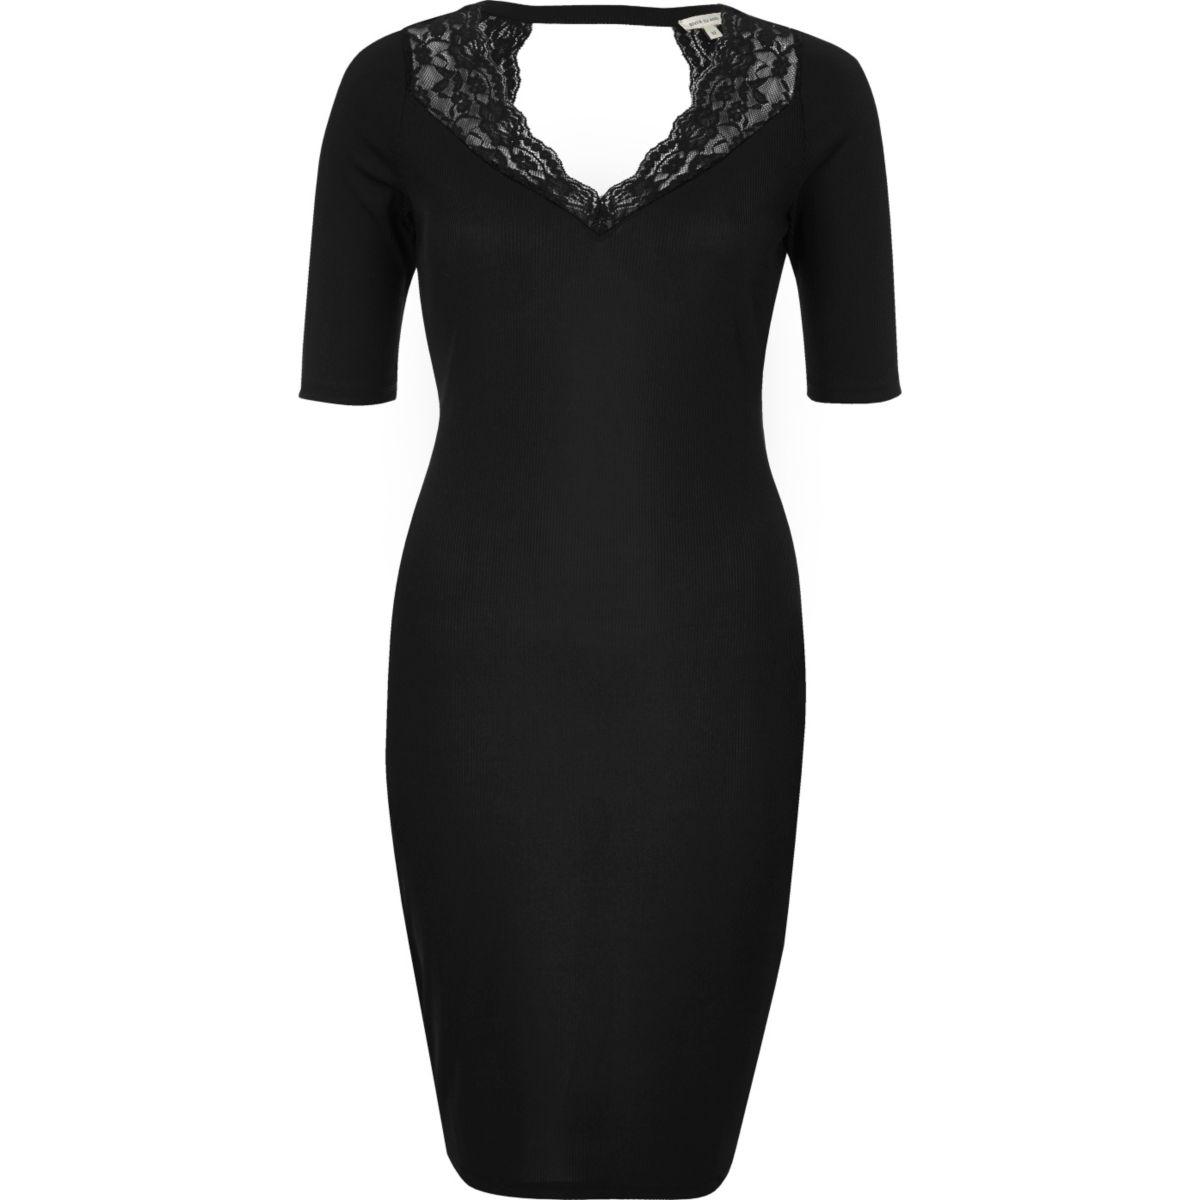 Black lace trim ribbed bodycon dress